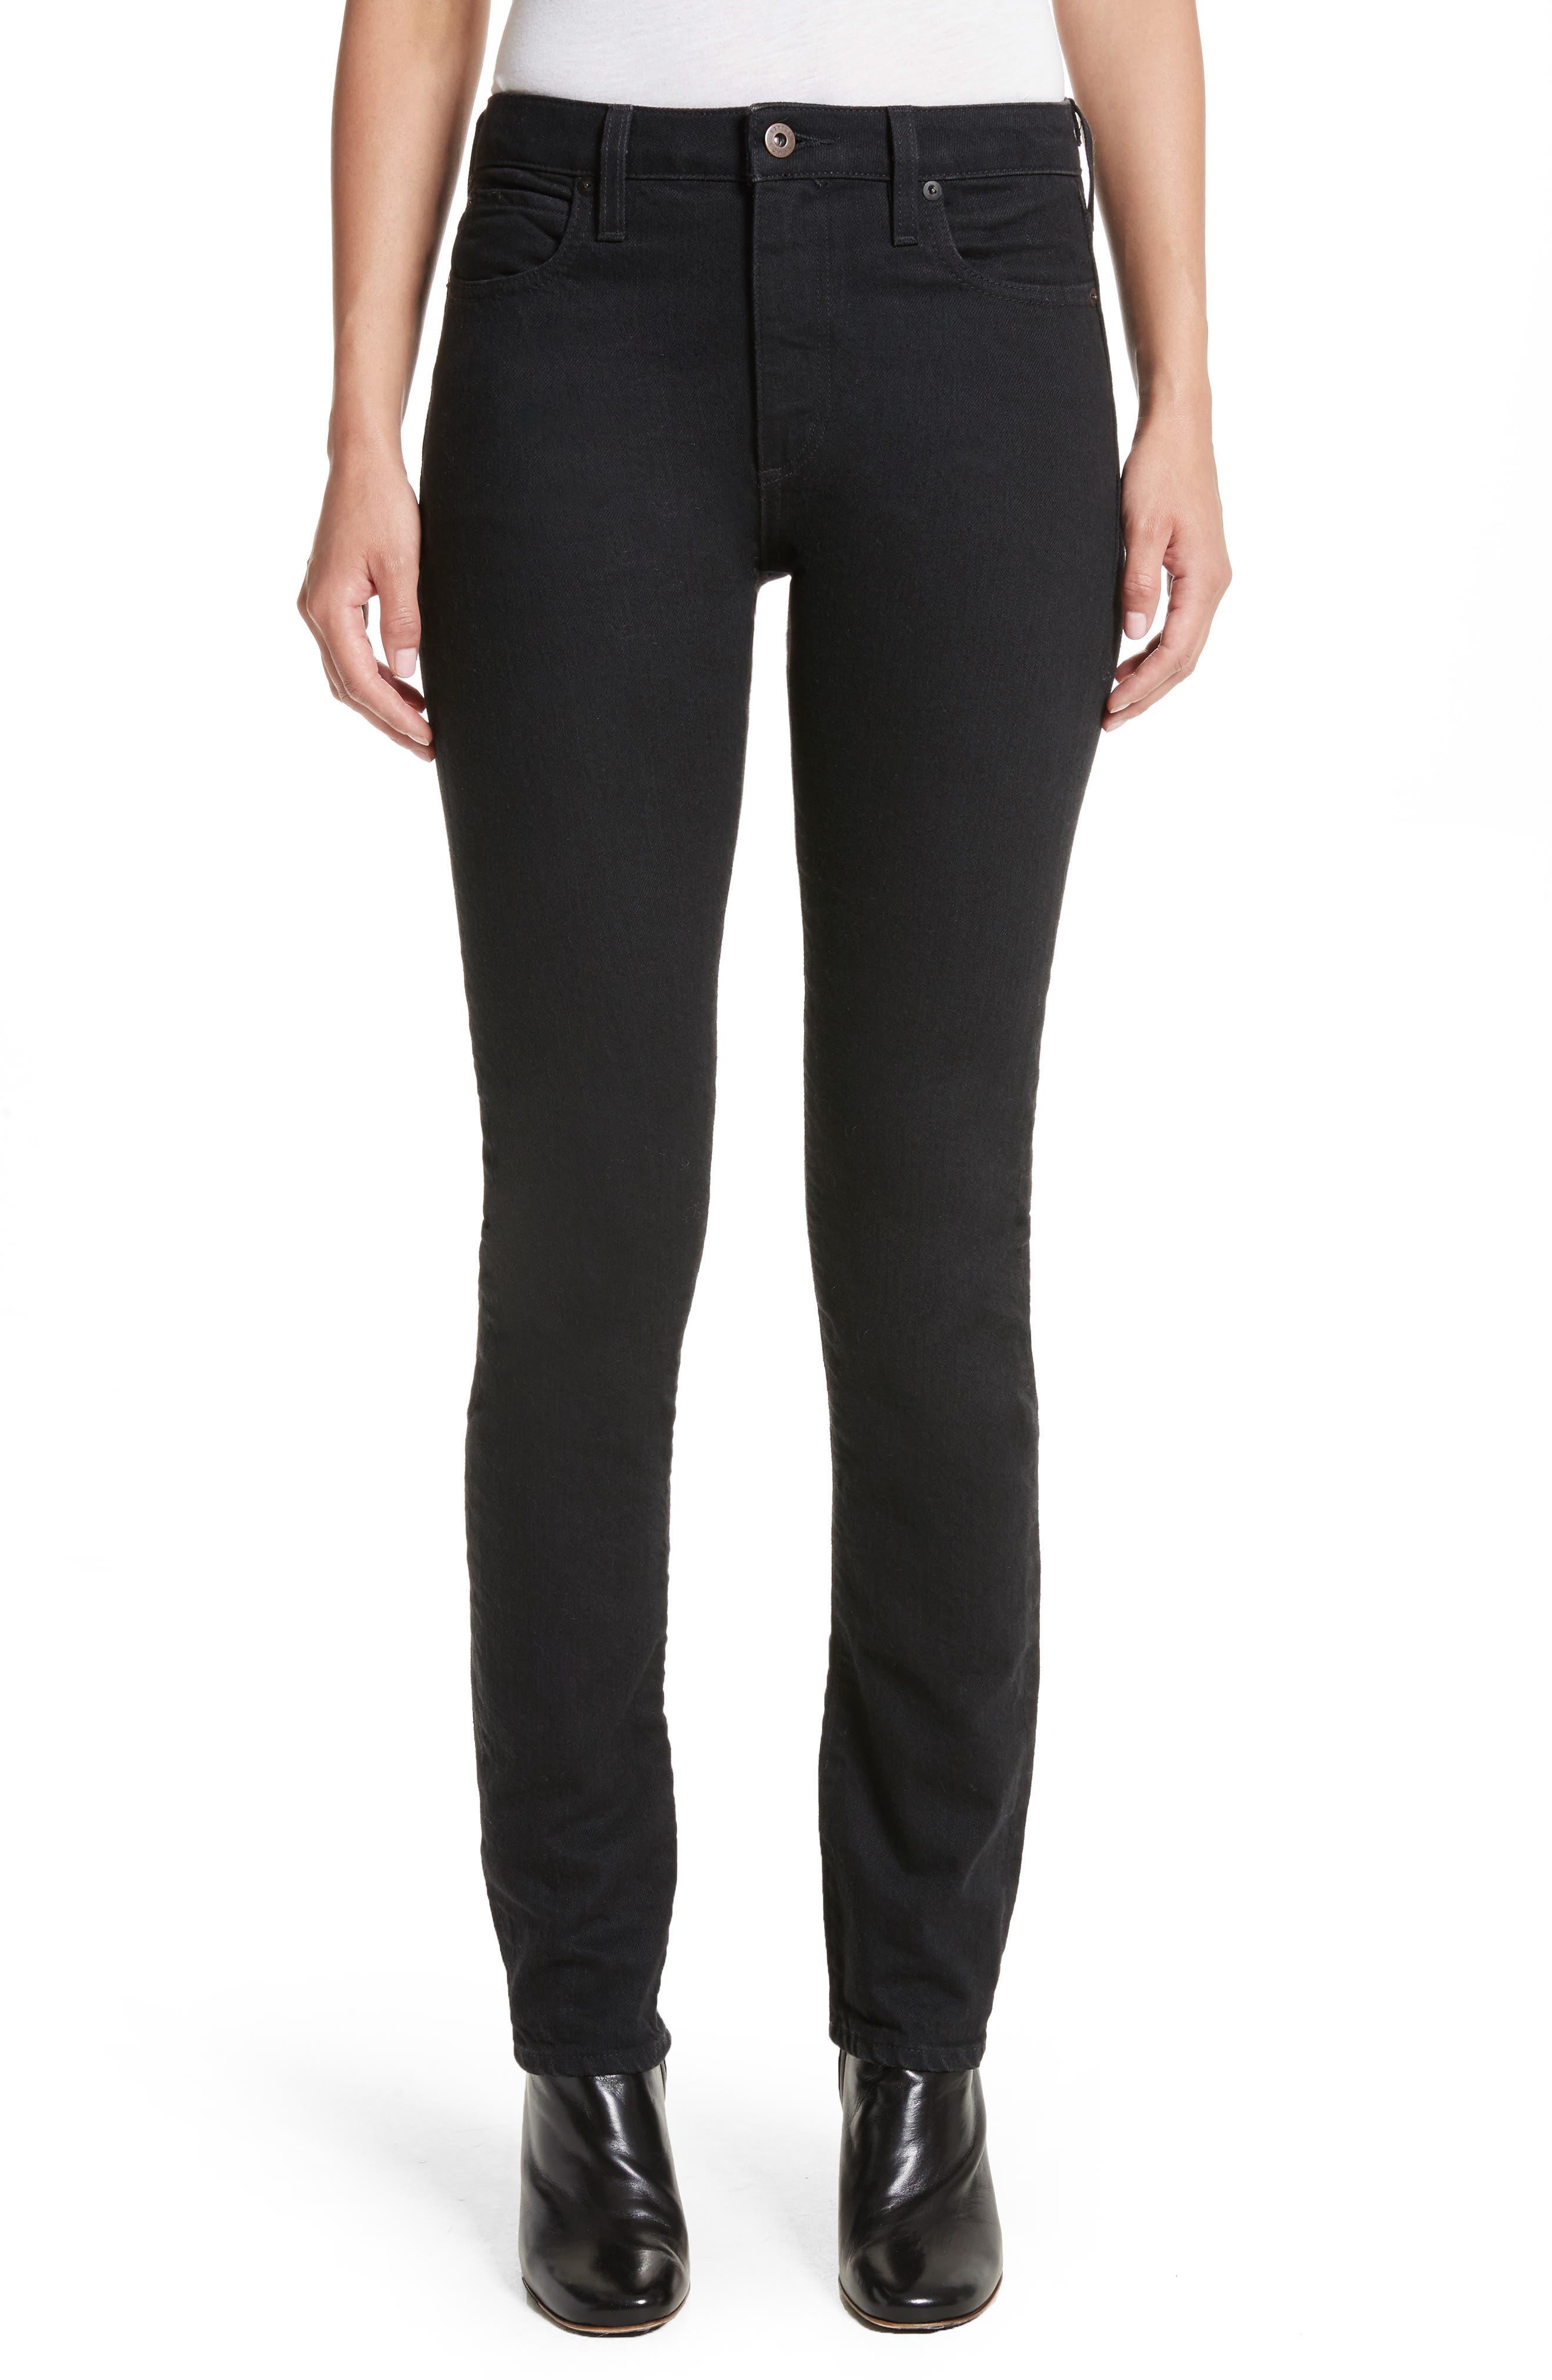 Boyd High Rise Jeans,                         Main,                         color, Black